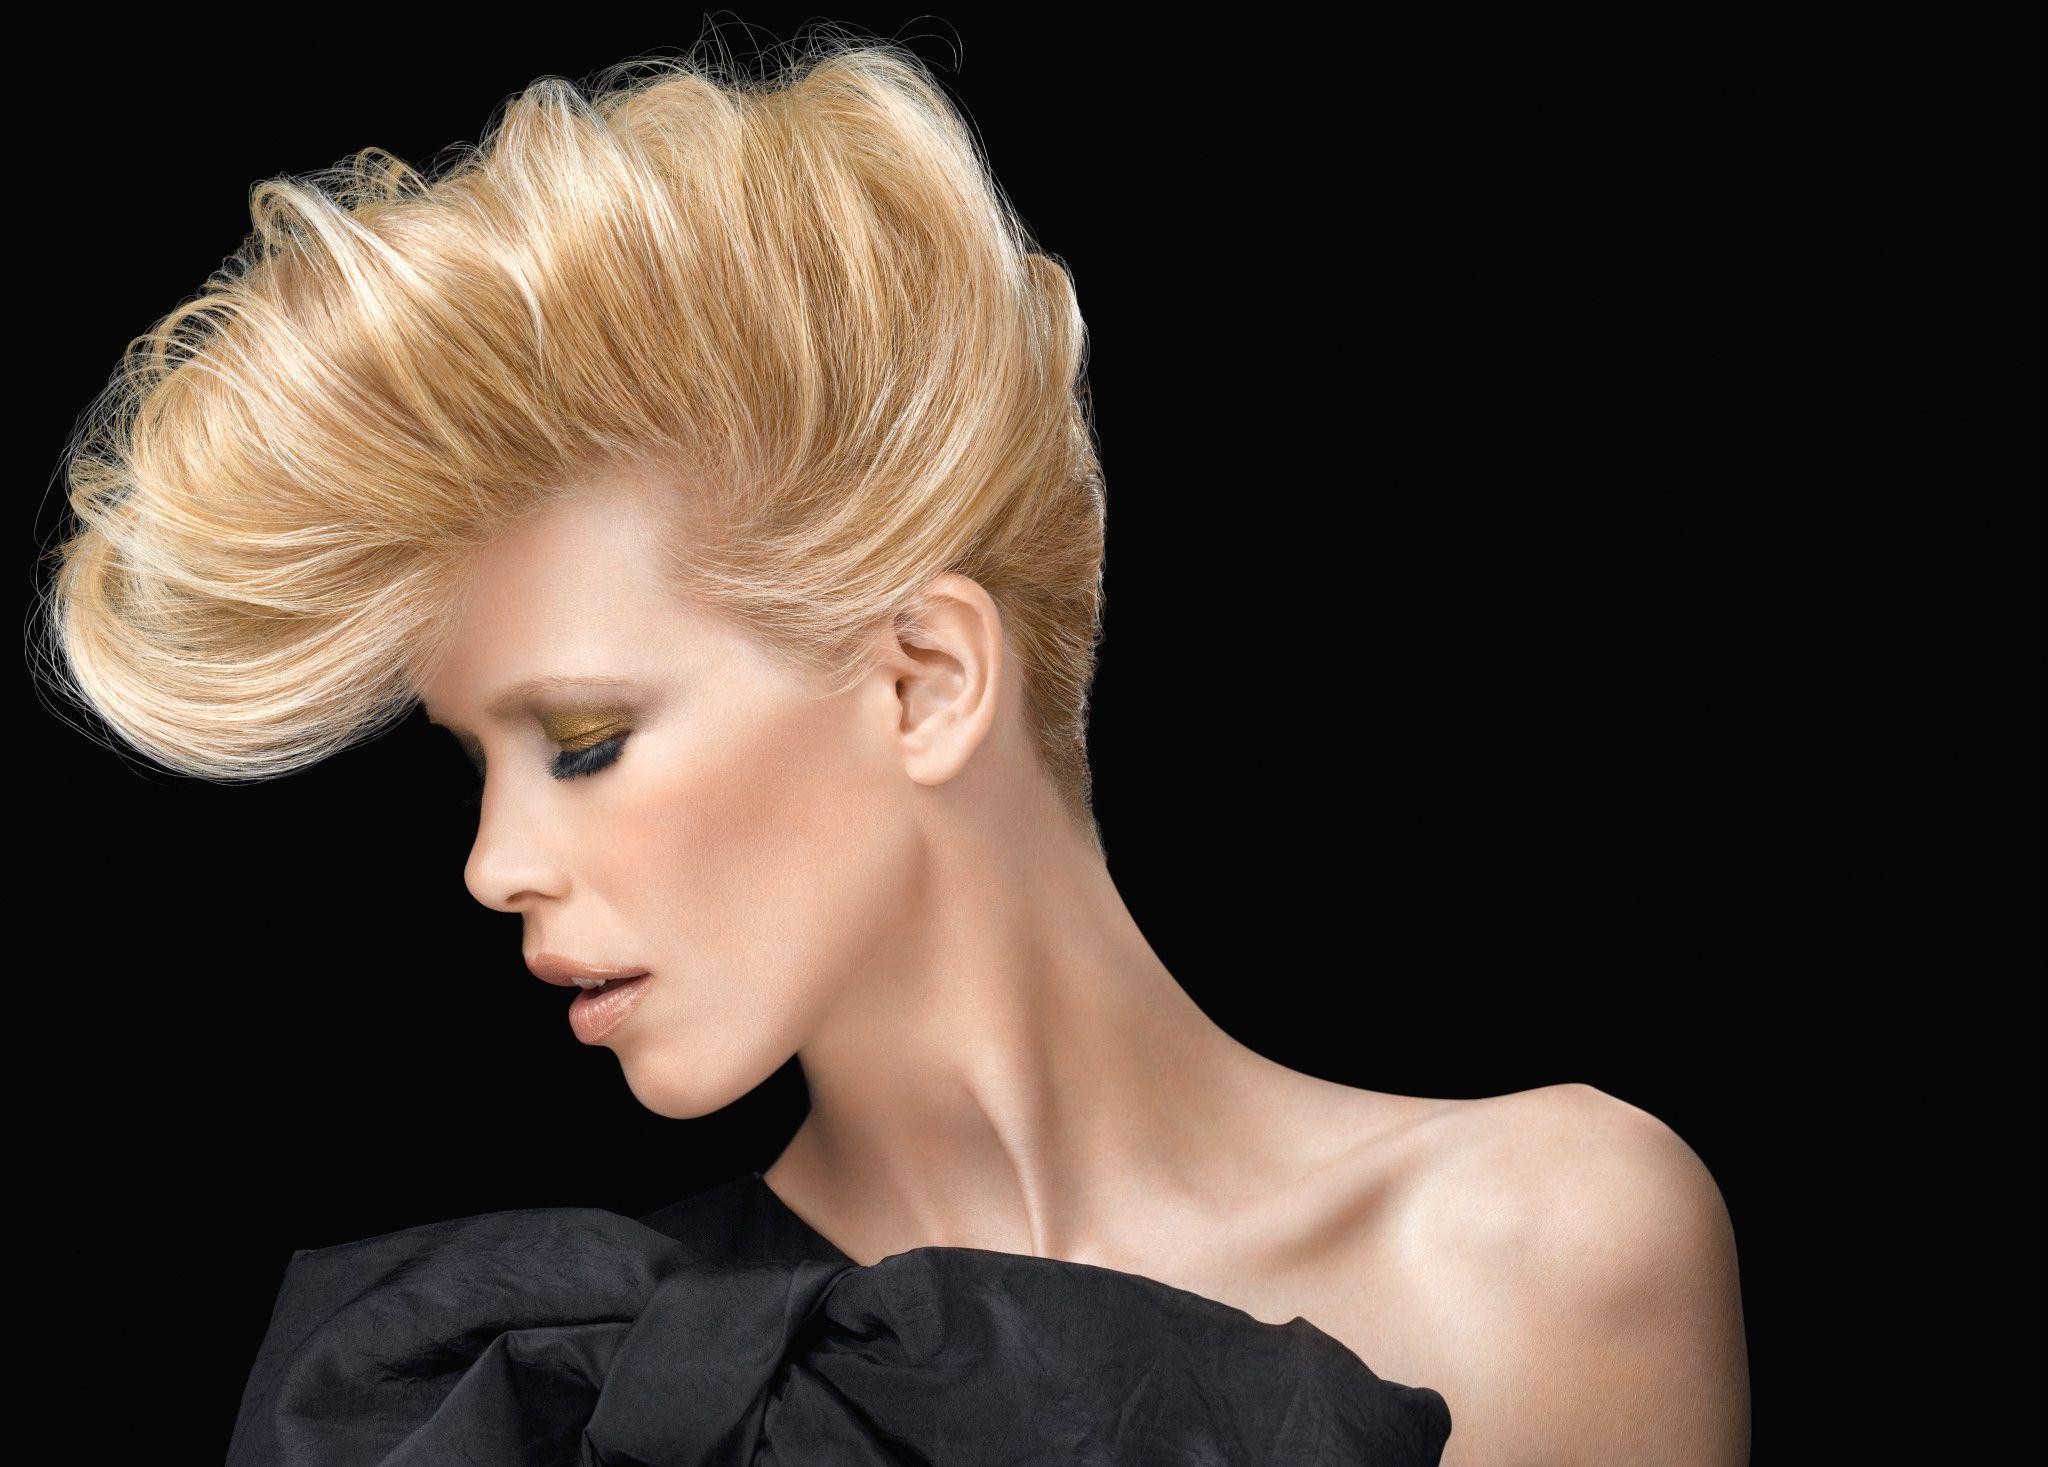 Claudia Schiffer L Oreal Paris Models Pinterest